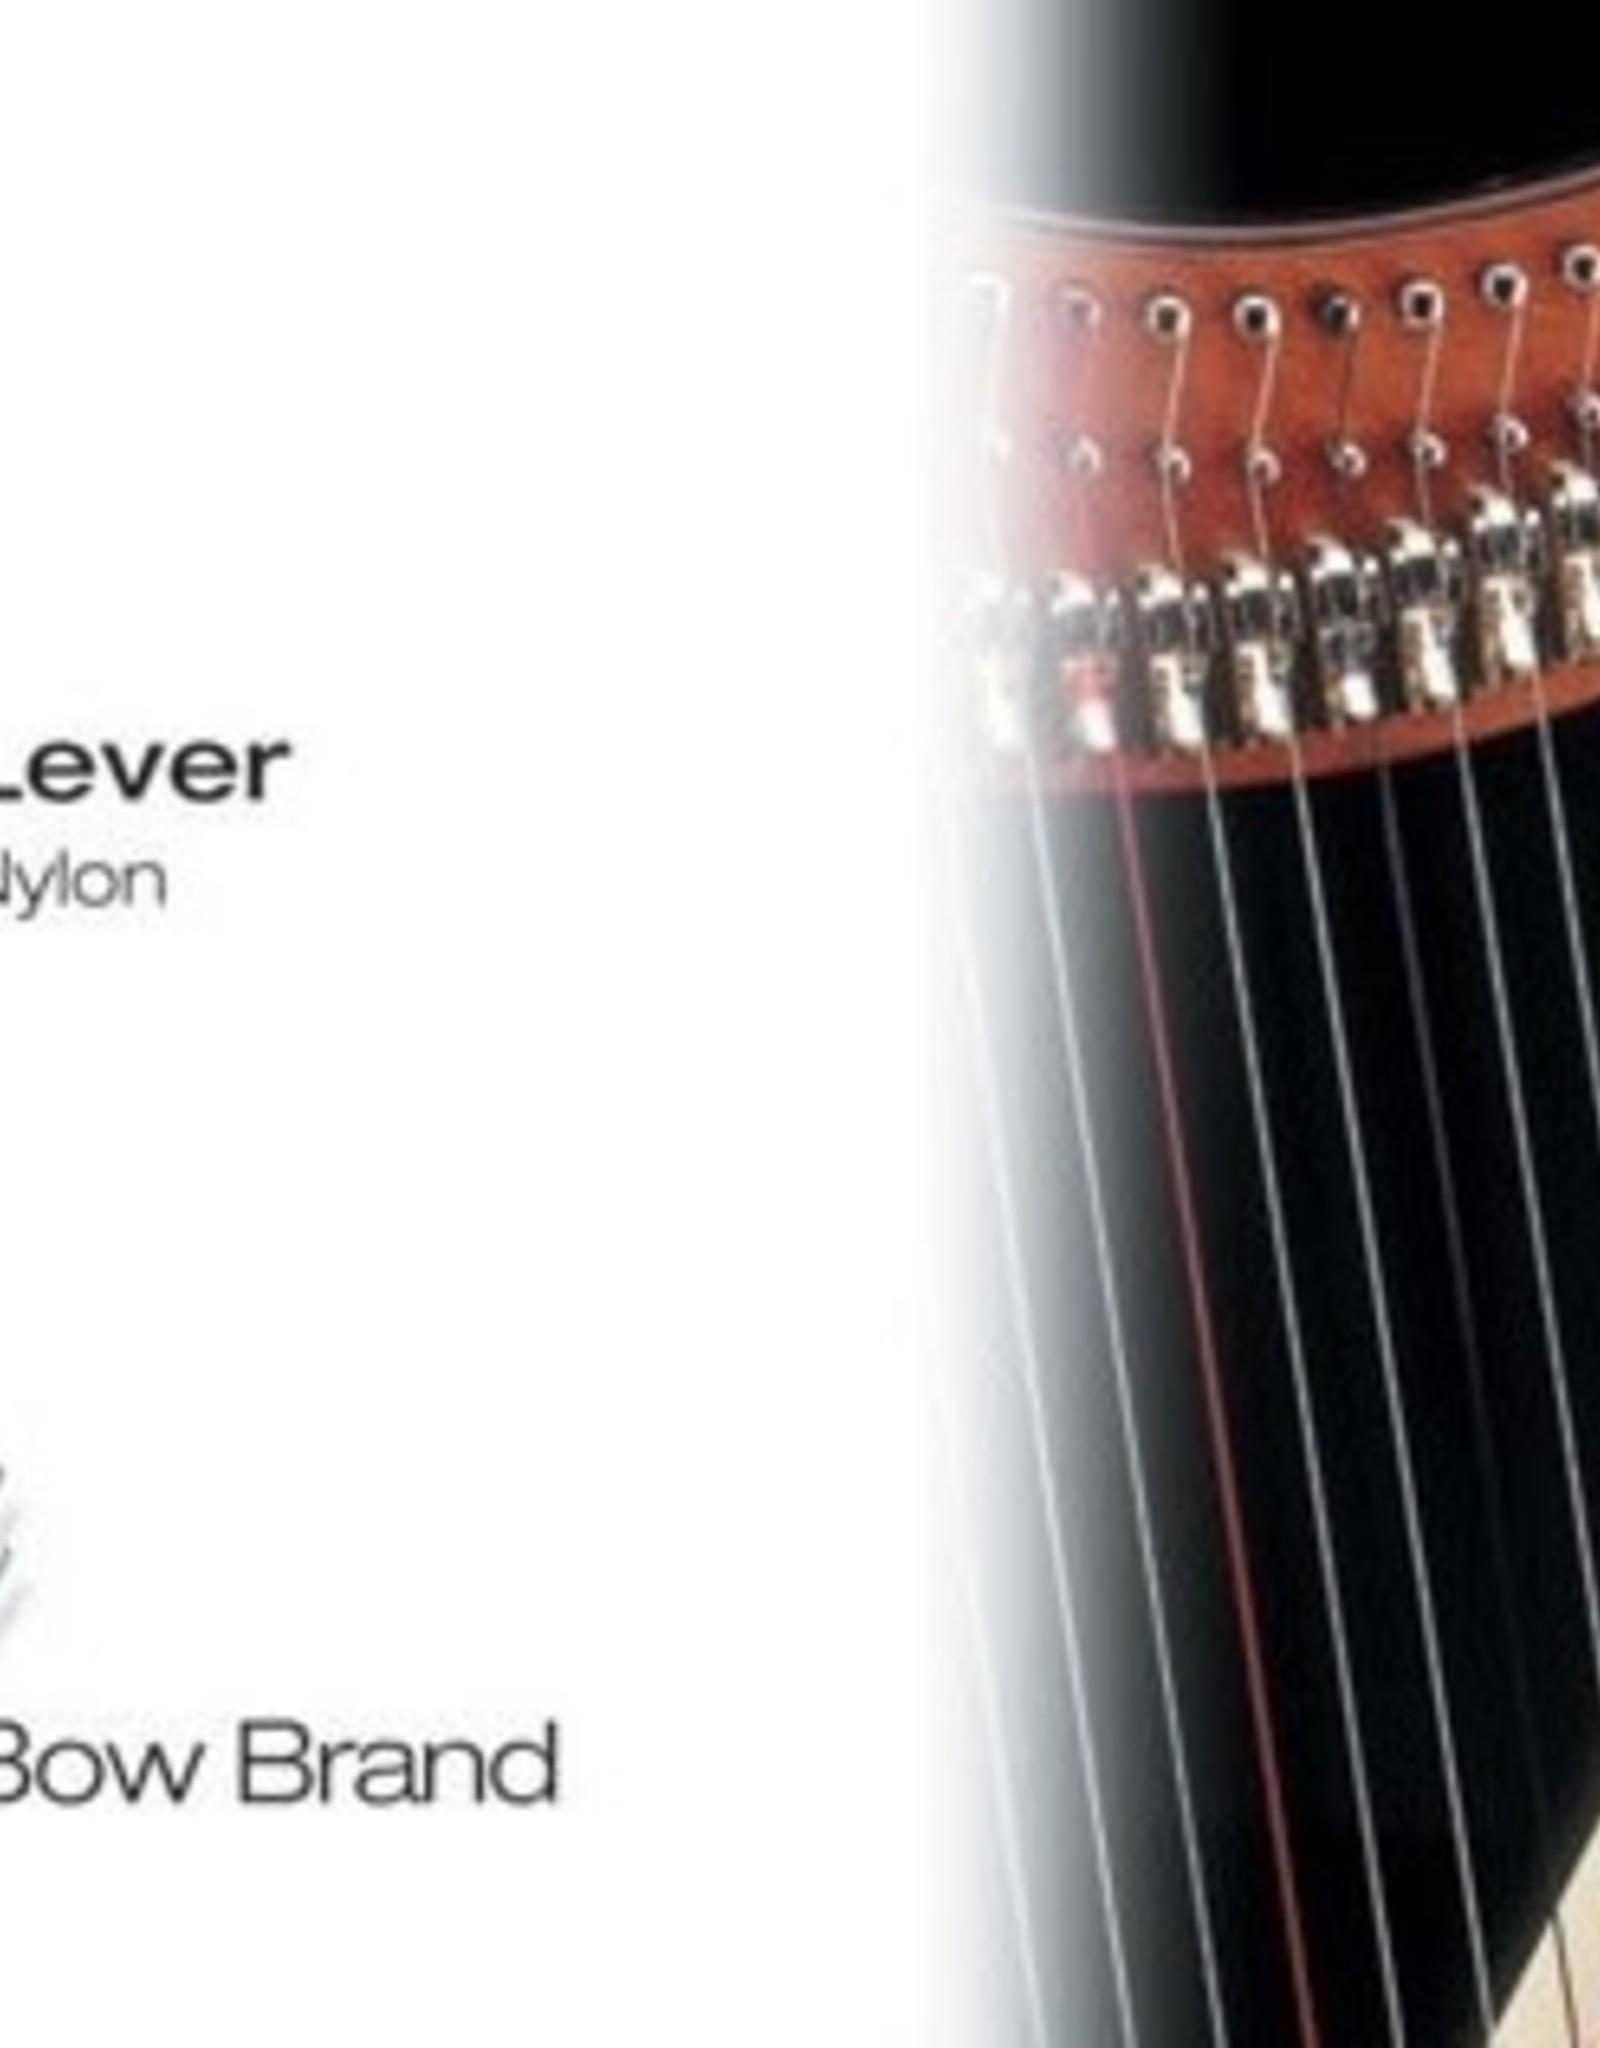 BOW BRAND  klep nylon - lever NYLON 10/2 do